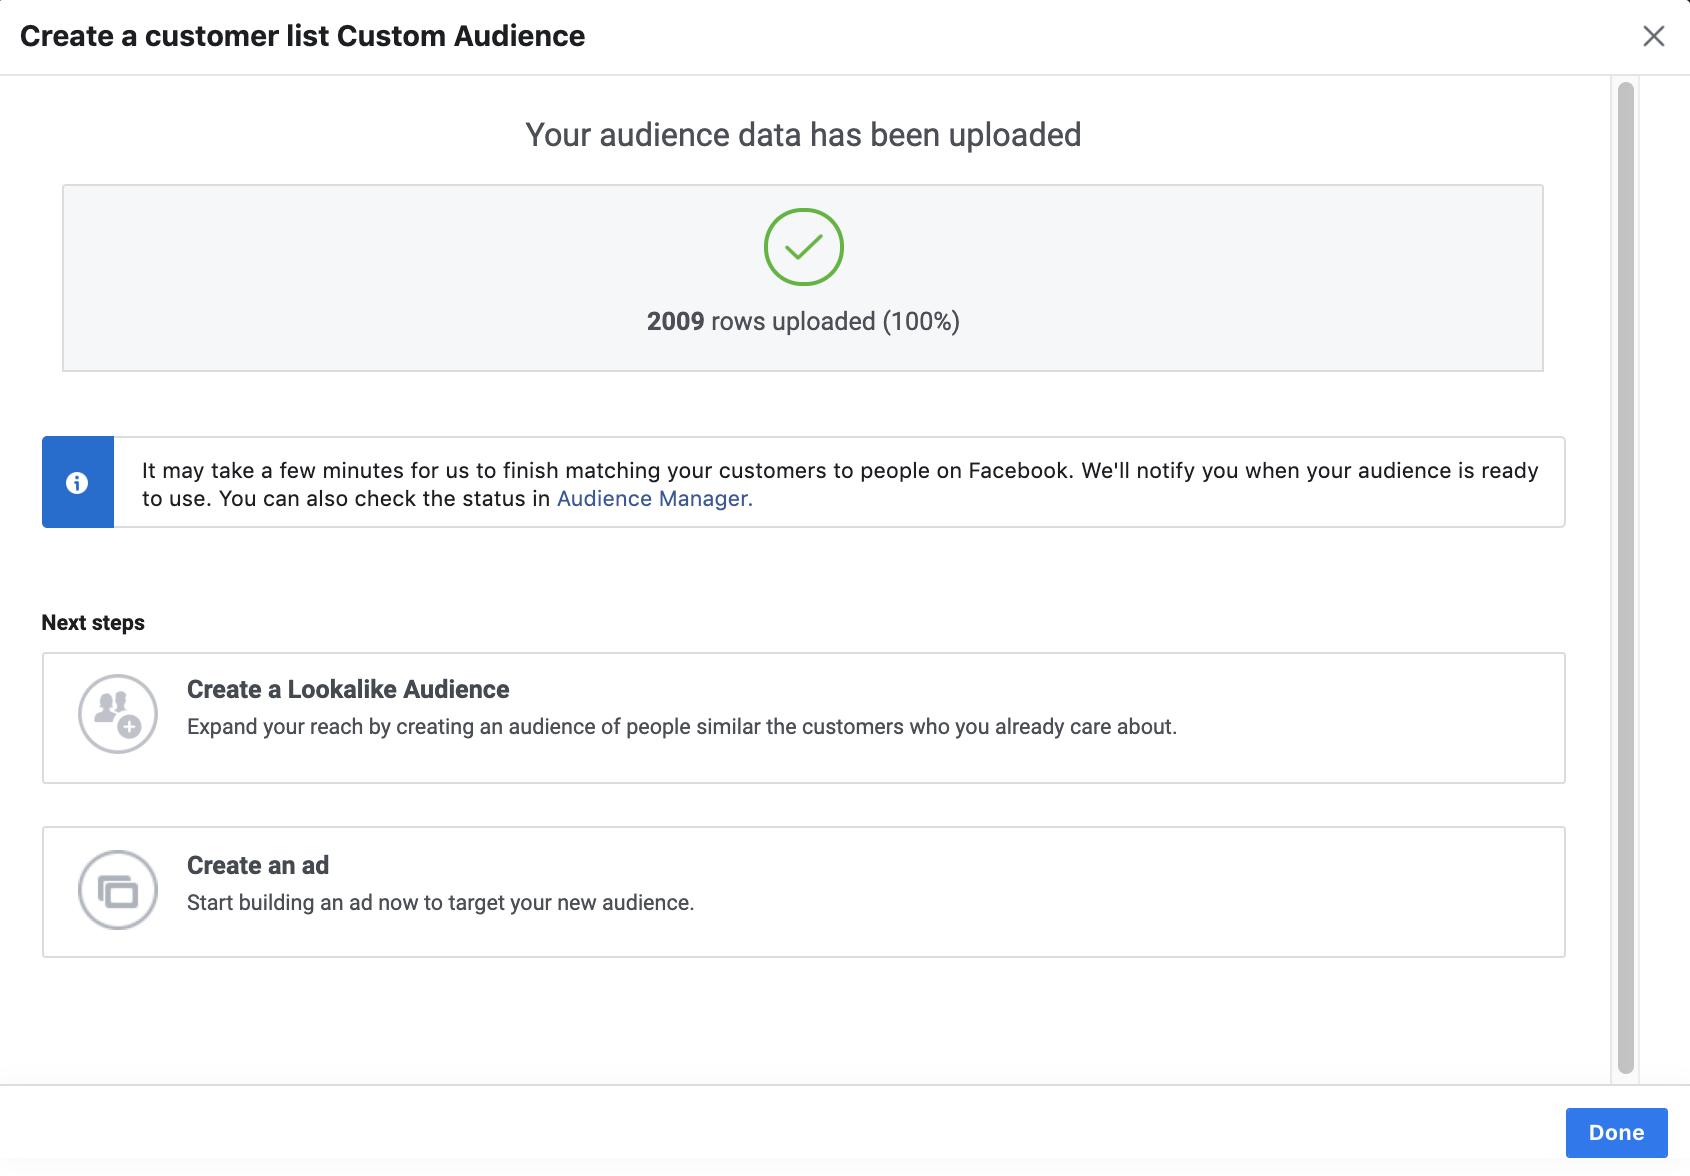 Successfully created a Custom Audience